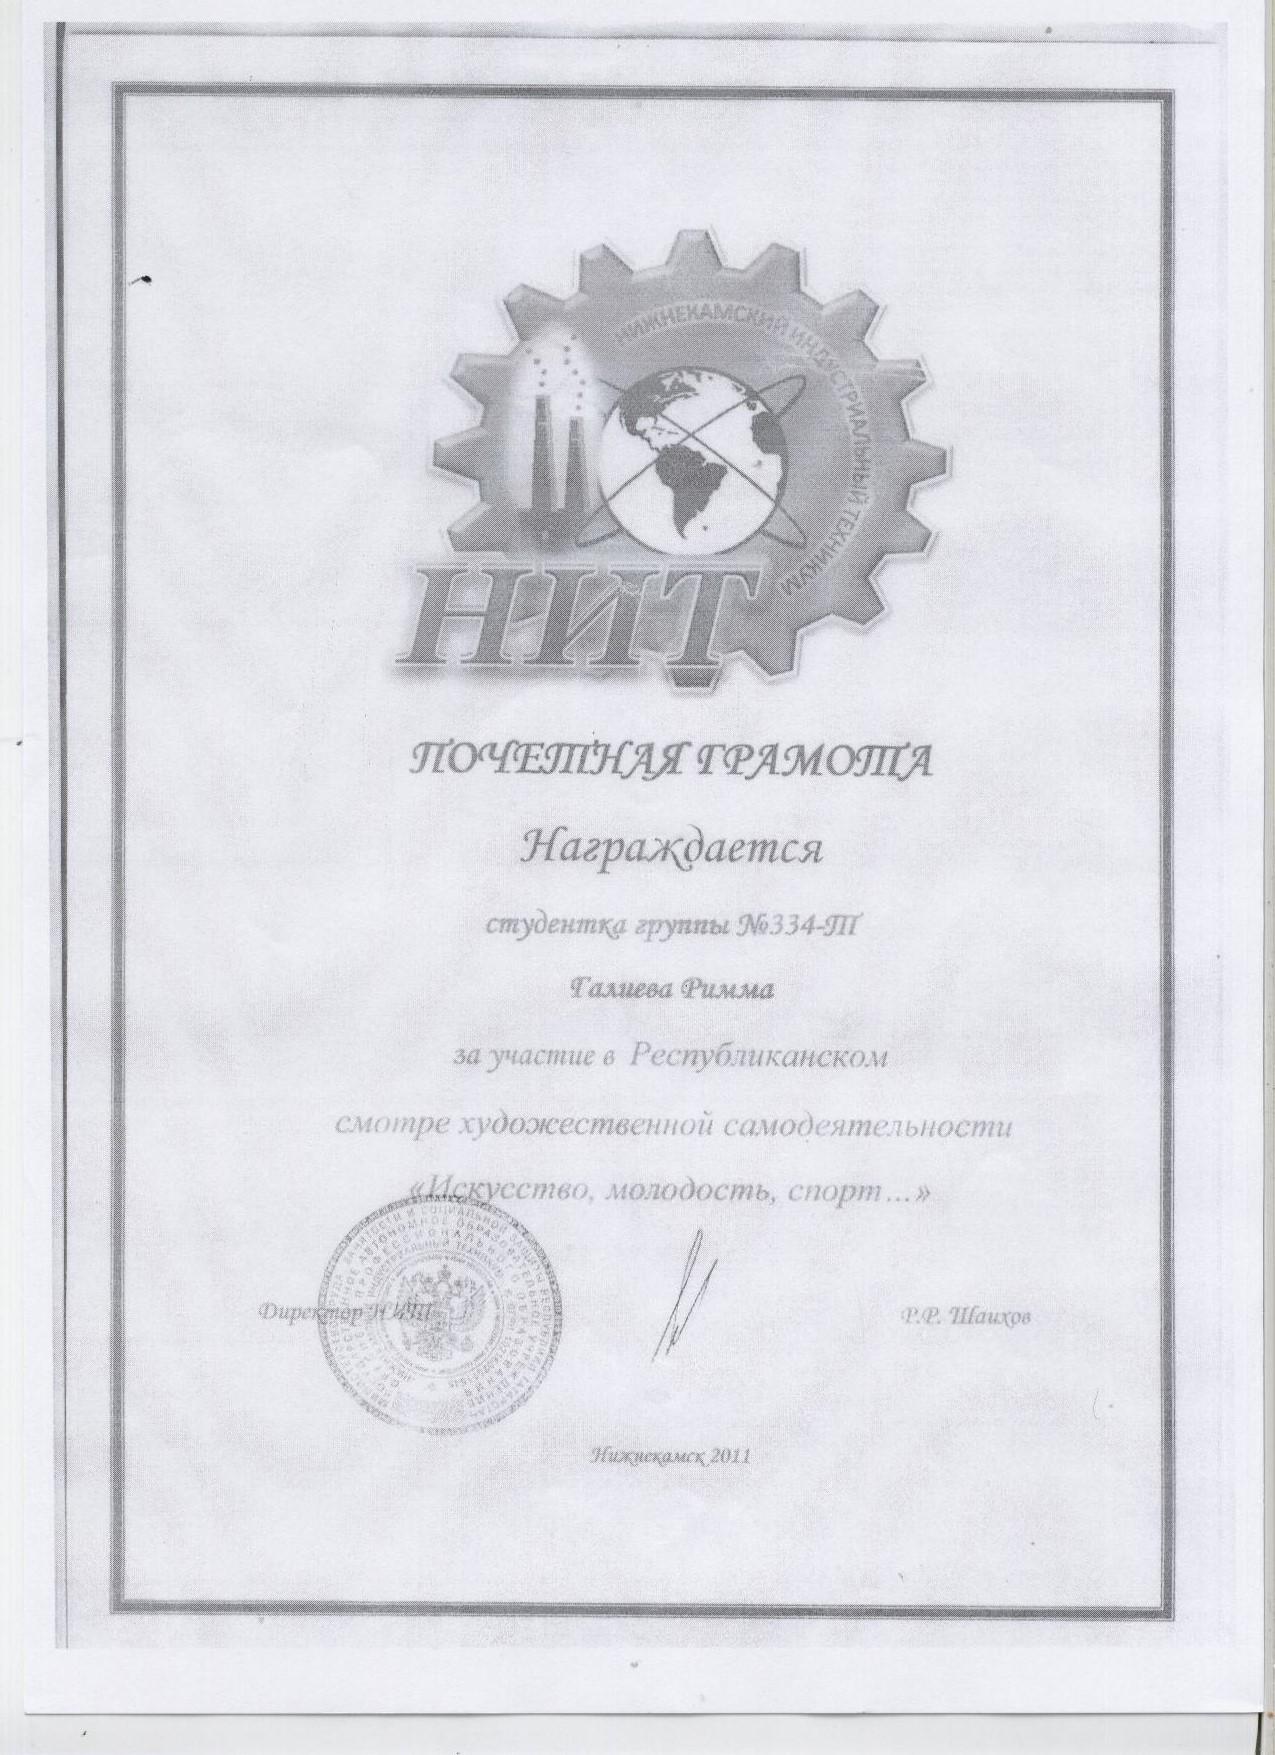 F:\Всероссйский конкурс Портфолио выпускника\РИММА\Римма 025.jpg